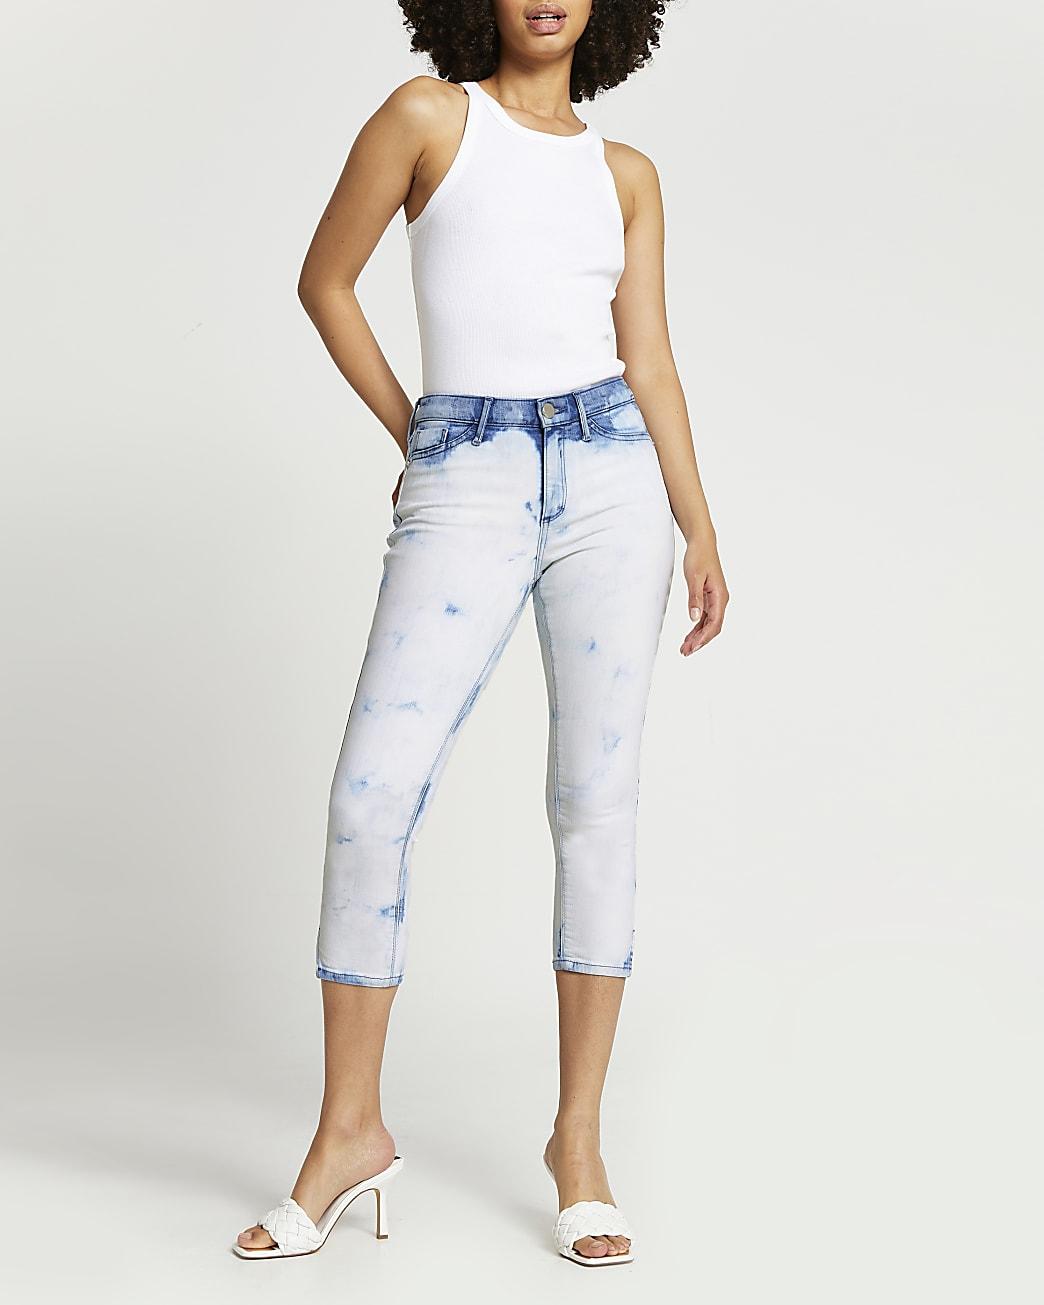 White Molly tie dye cropped jeans